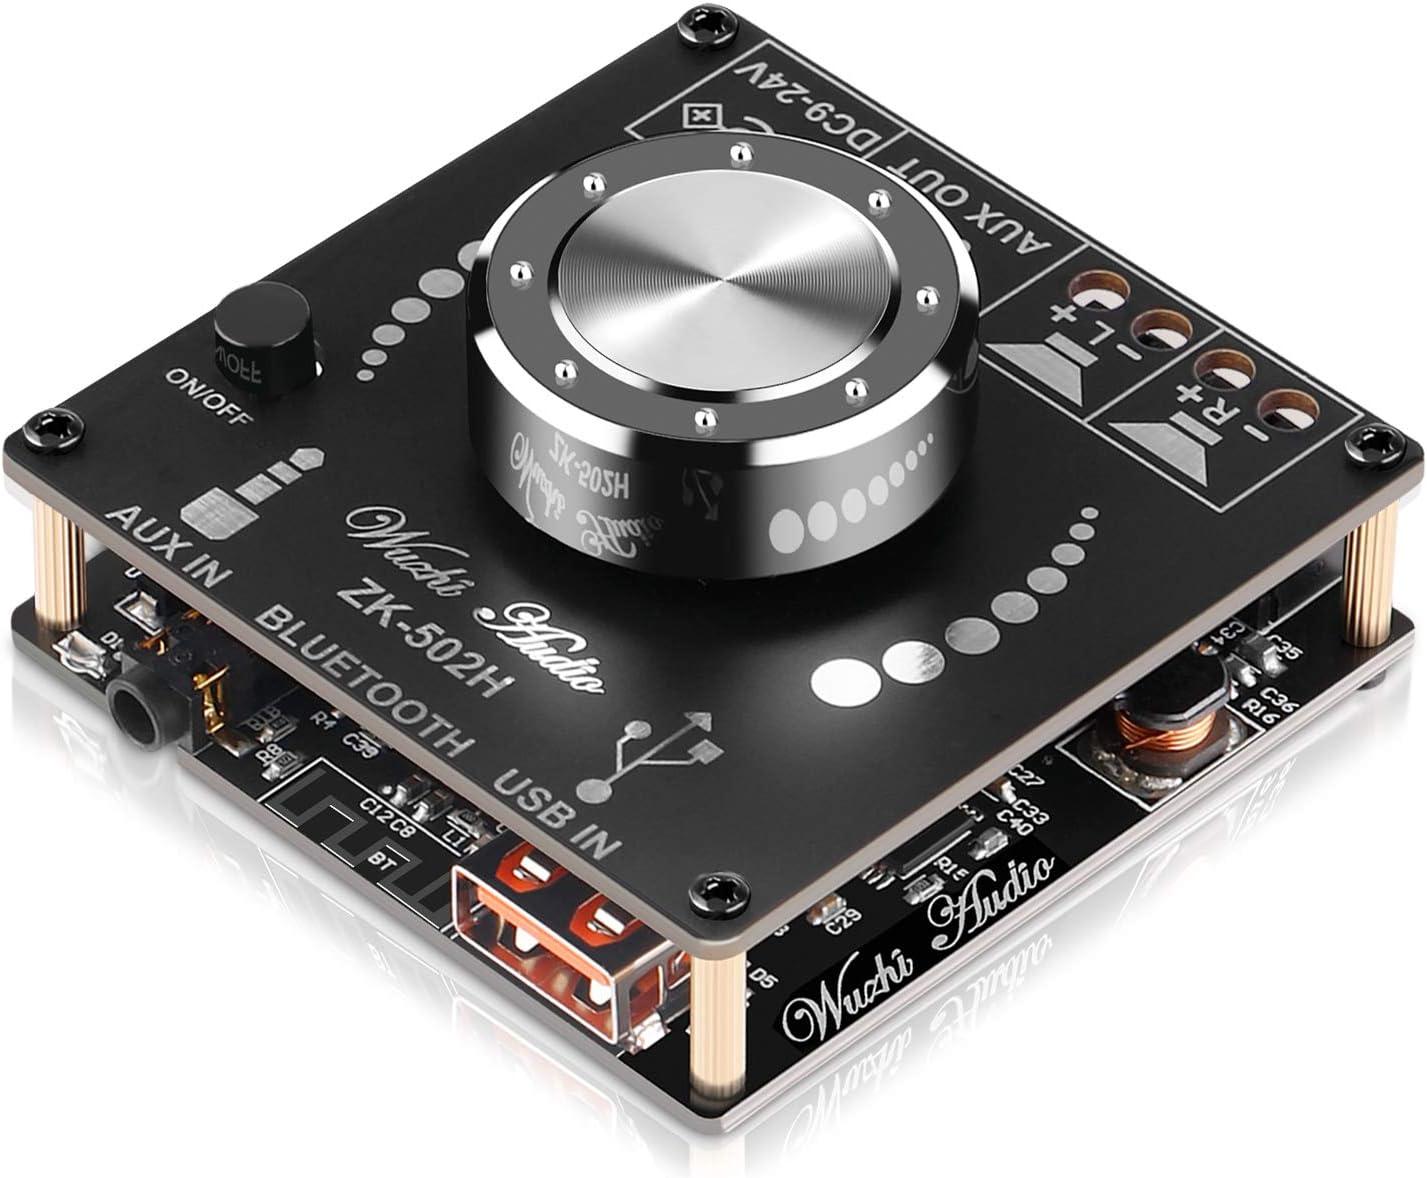 MakerHawk Bluetooth Amplifier Board Hifi Stereo 2.0 2X50W Audio Amplifier Module TPA3116D2 Digital Power Amplifier Bluetooth 5.0 Dual Channel AMP with AUX/USB/Bluetooth/Flash Drive/PC Sound Card Input